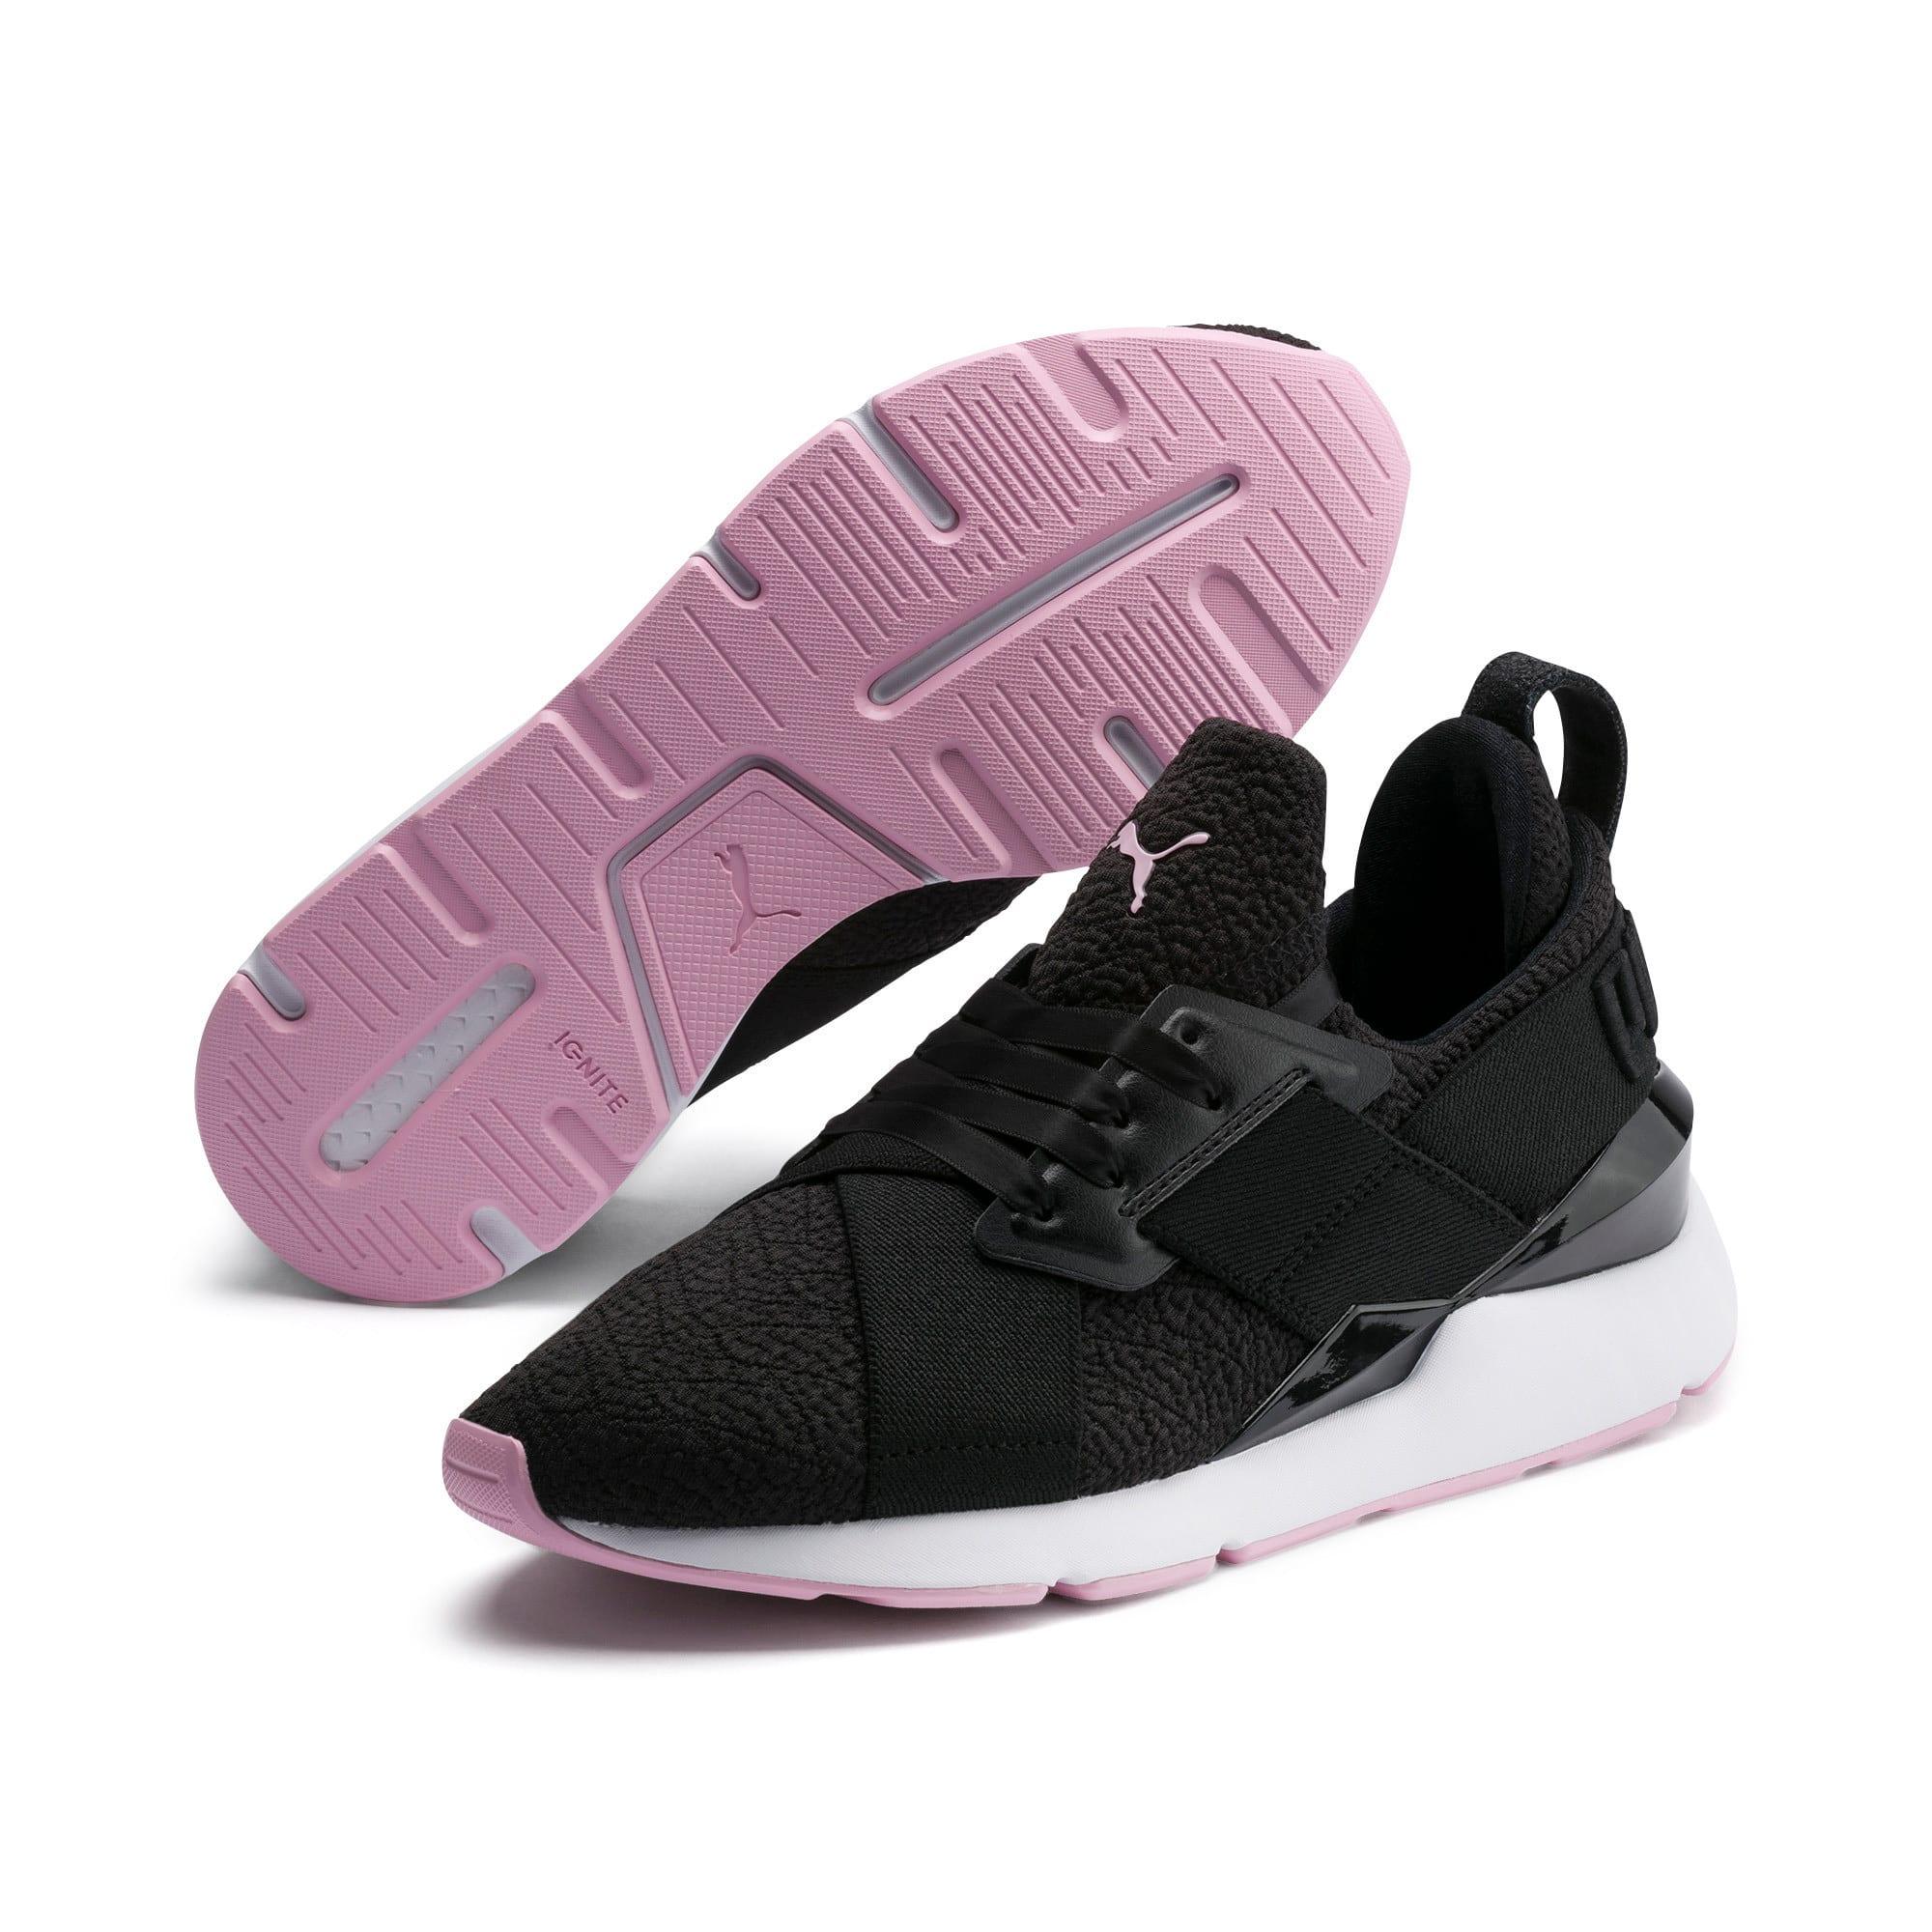 Thumbnail 2 of Muse TZ Damen Sneaker, Puma Black-Pale Pink, medium